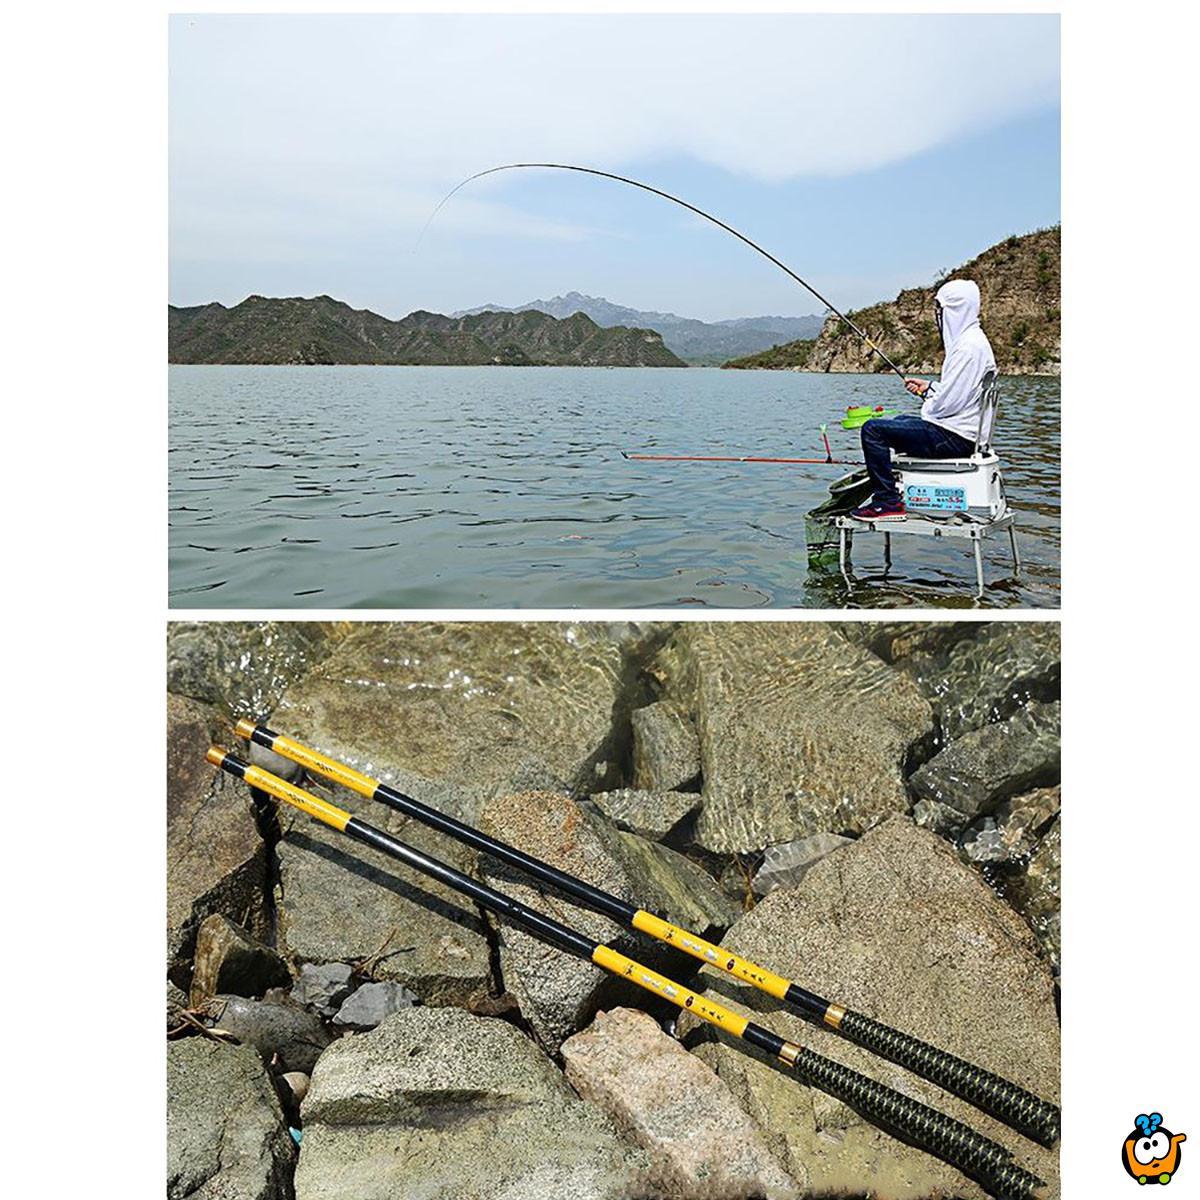 Fishing rod - Ribolovački štap